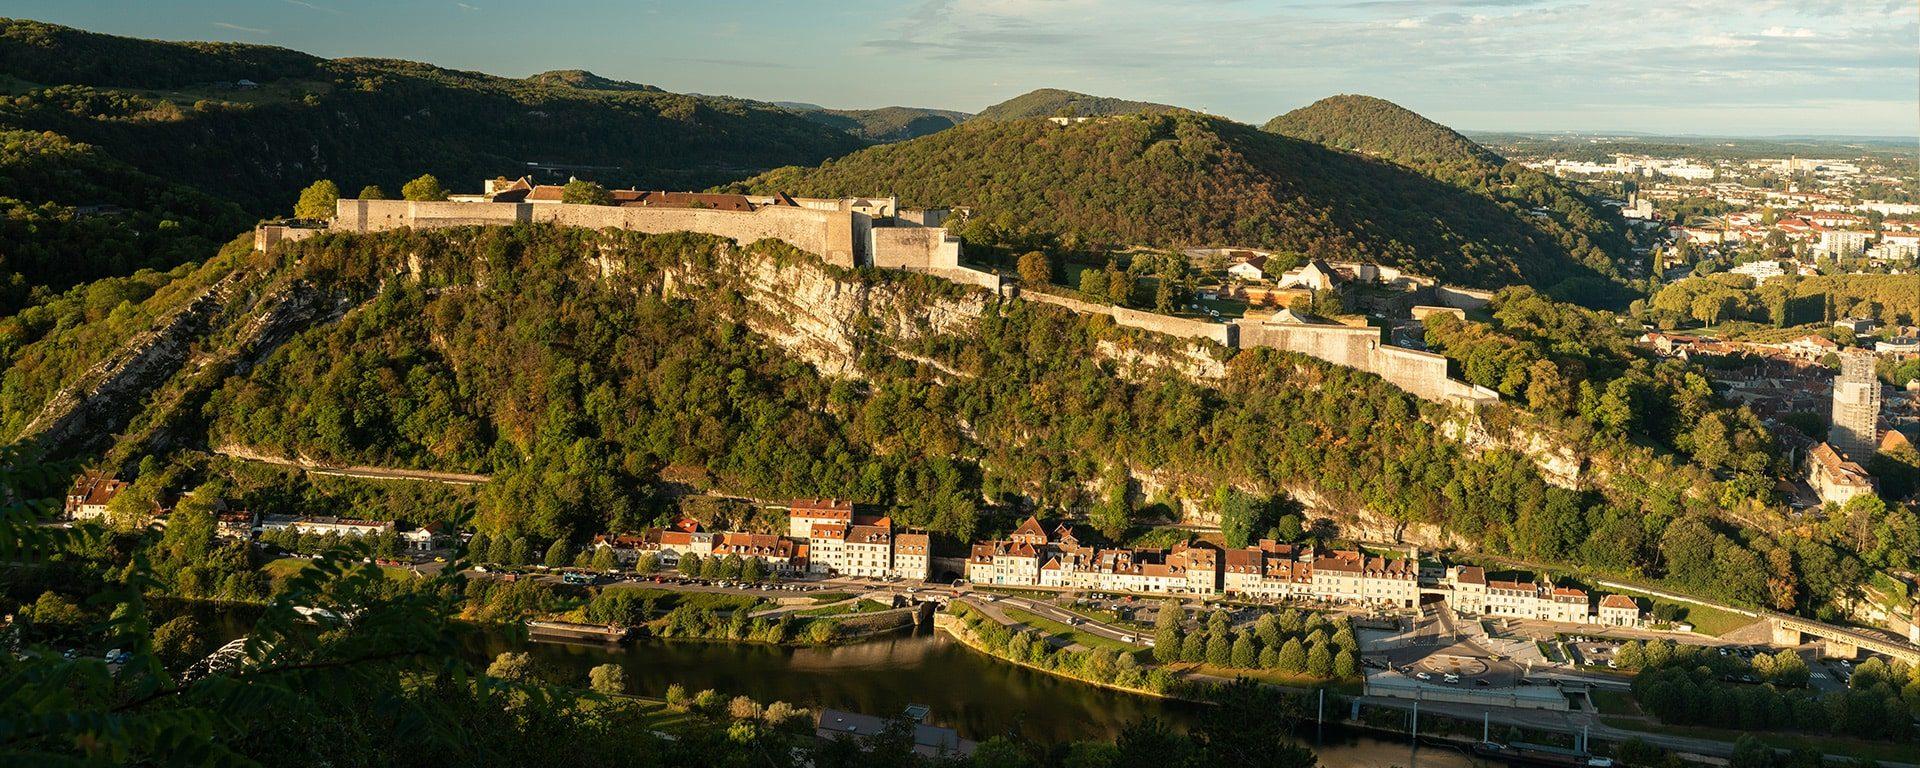 illustration La Citadelle de Besançon